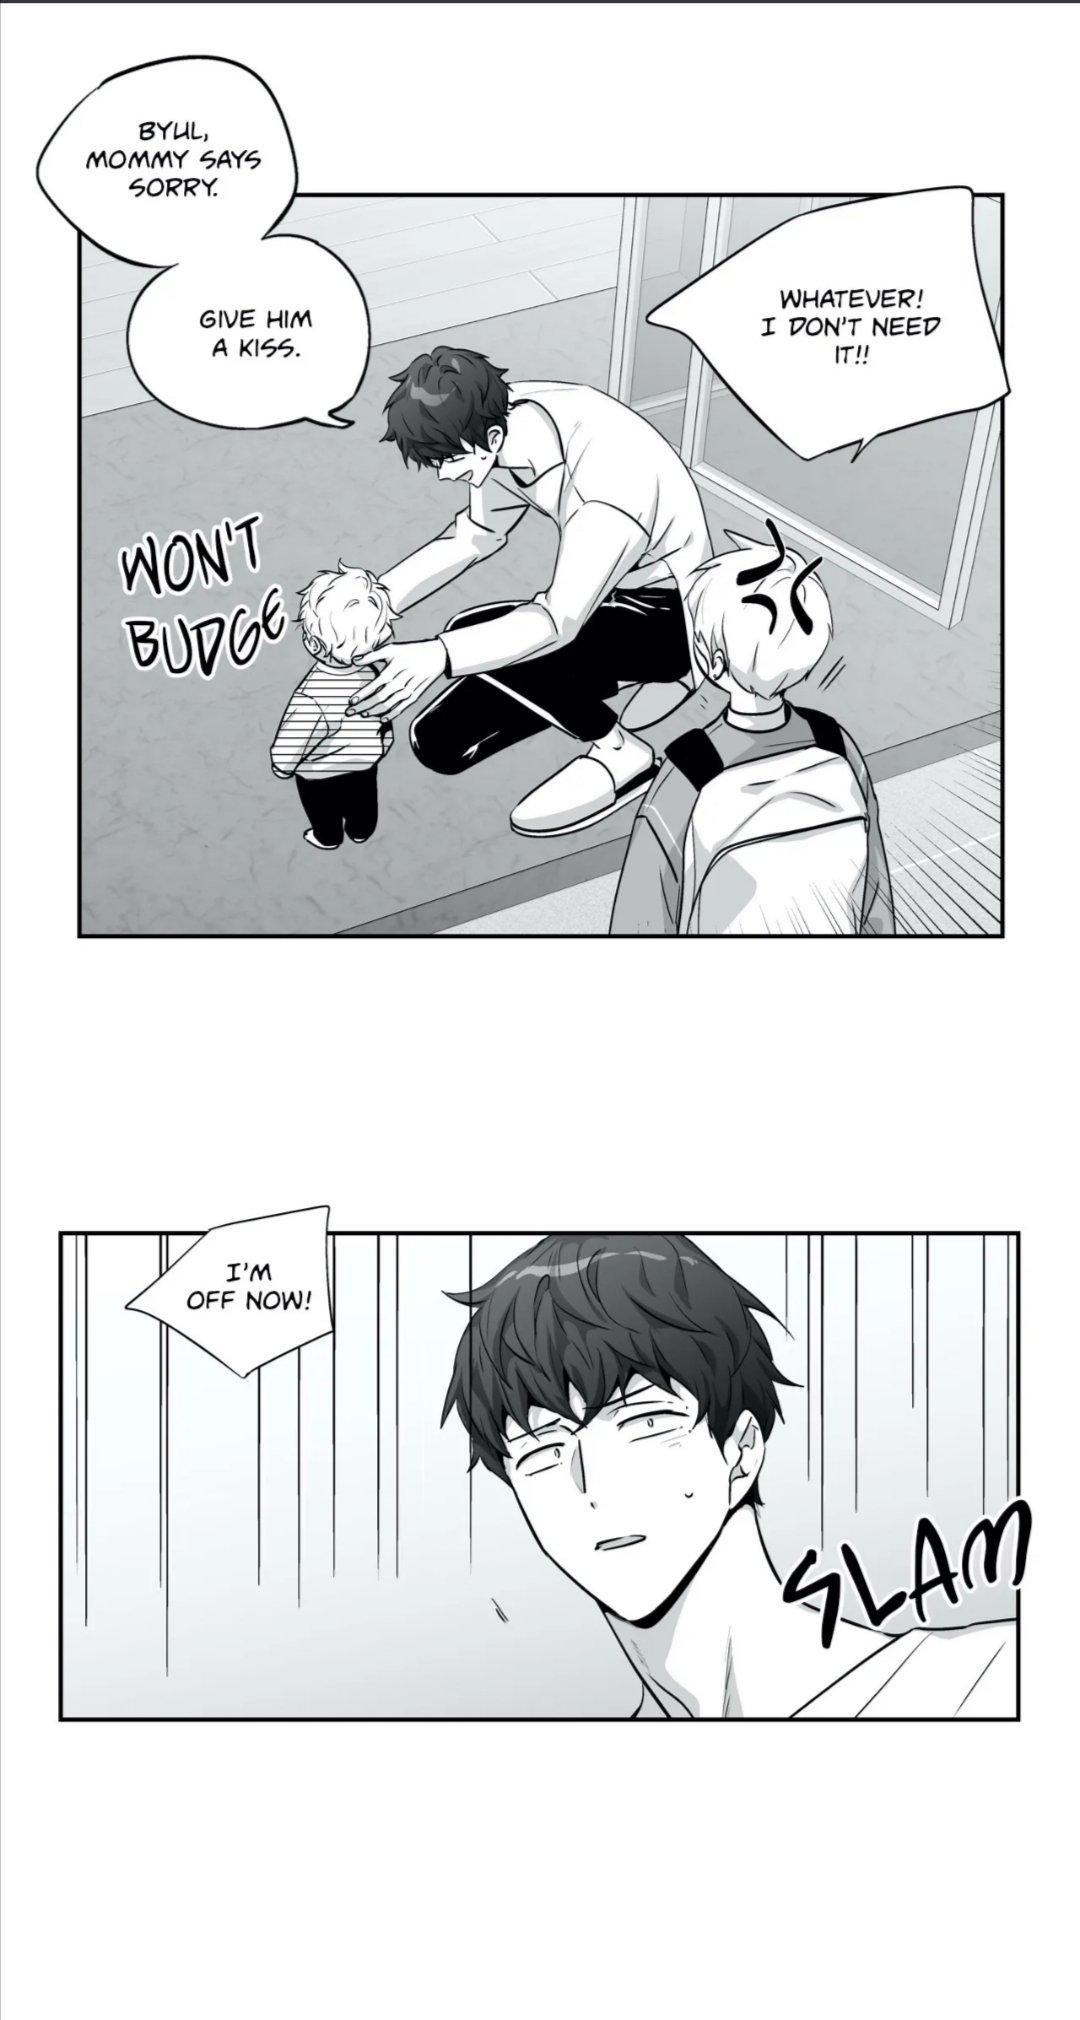 Read Love Is An Illusion Manga English New Chapters Online Free Mangaclash